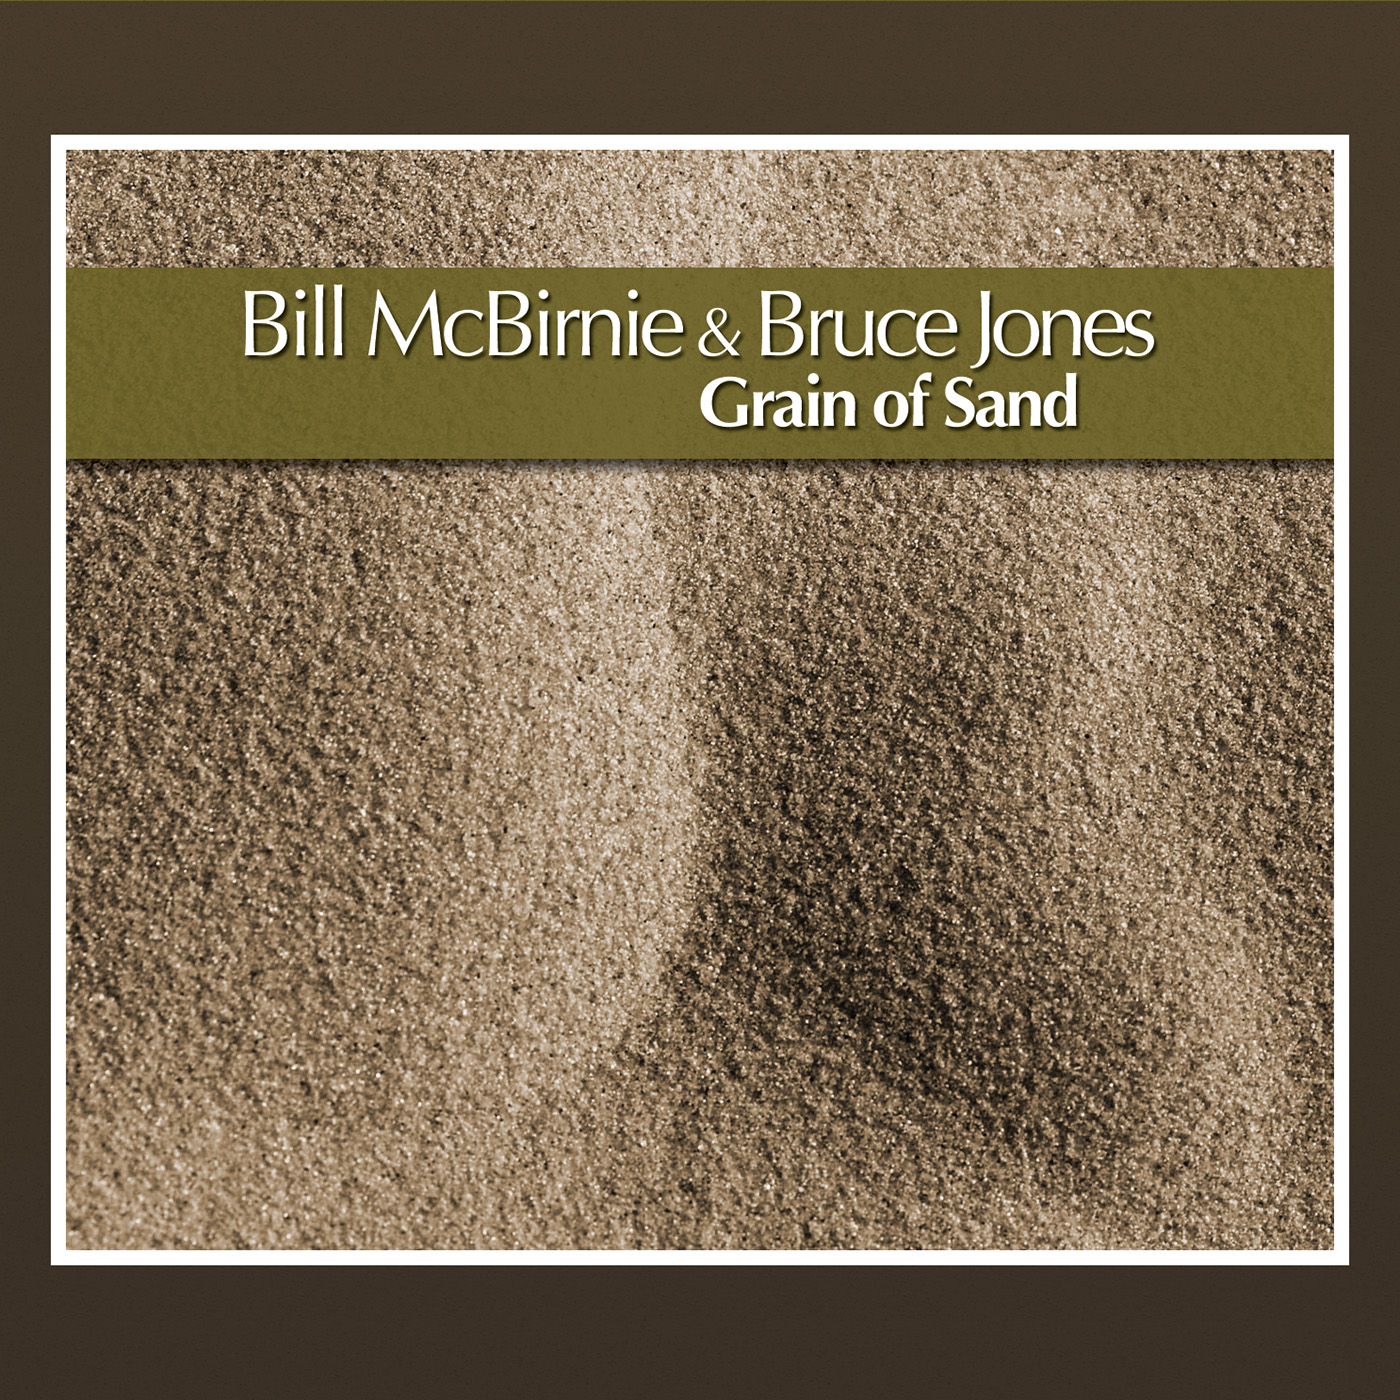 Grain of Sand by Bill McBirnie & Bruce Jones